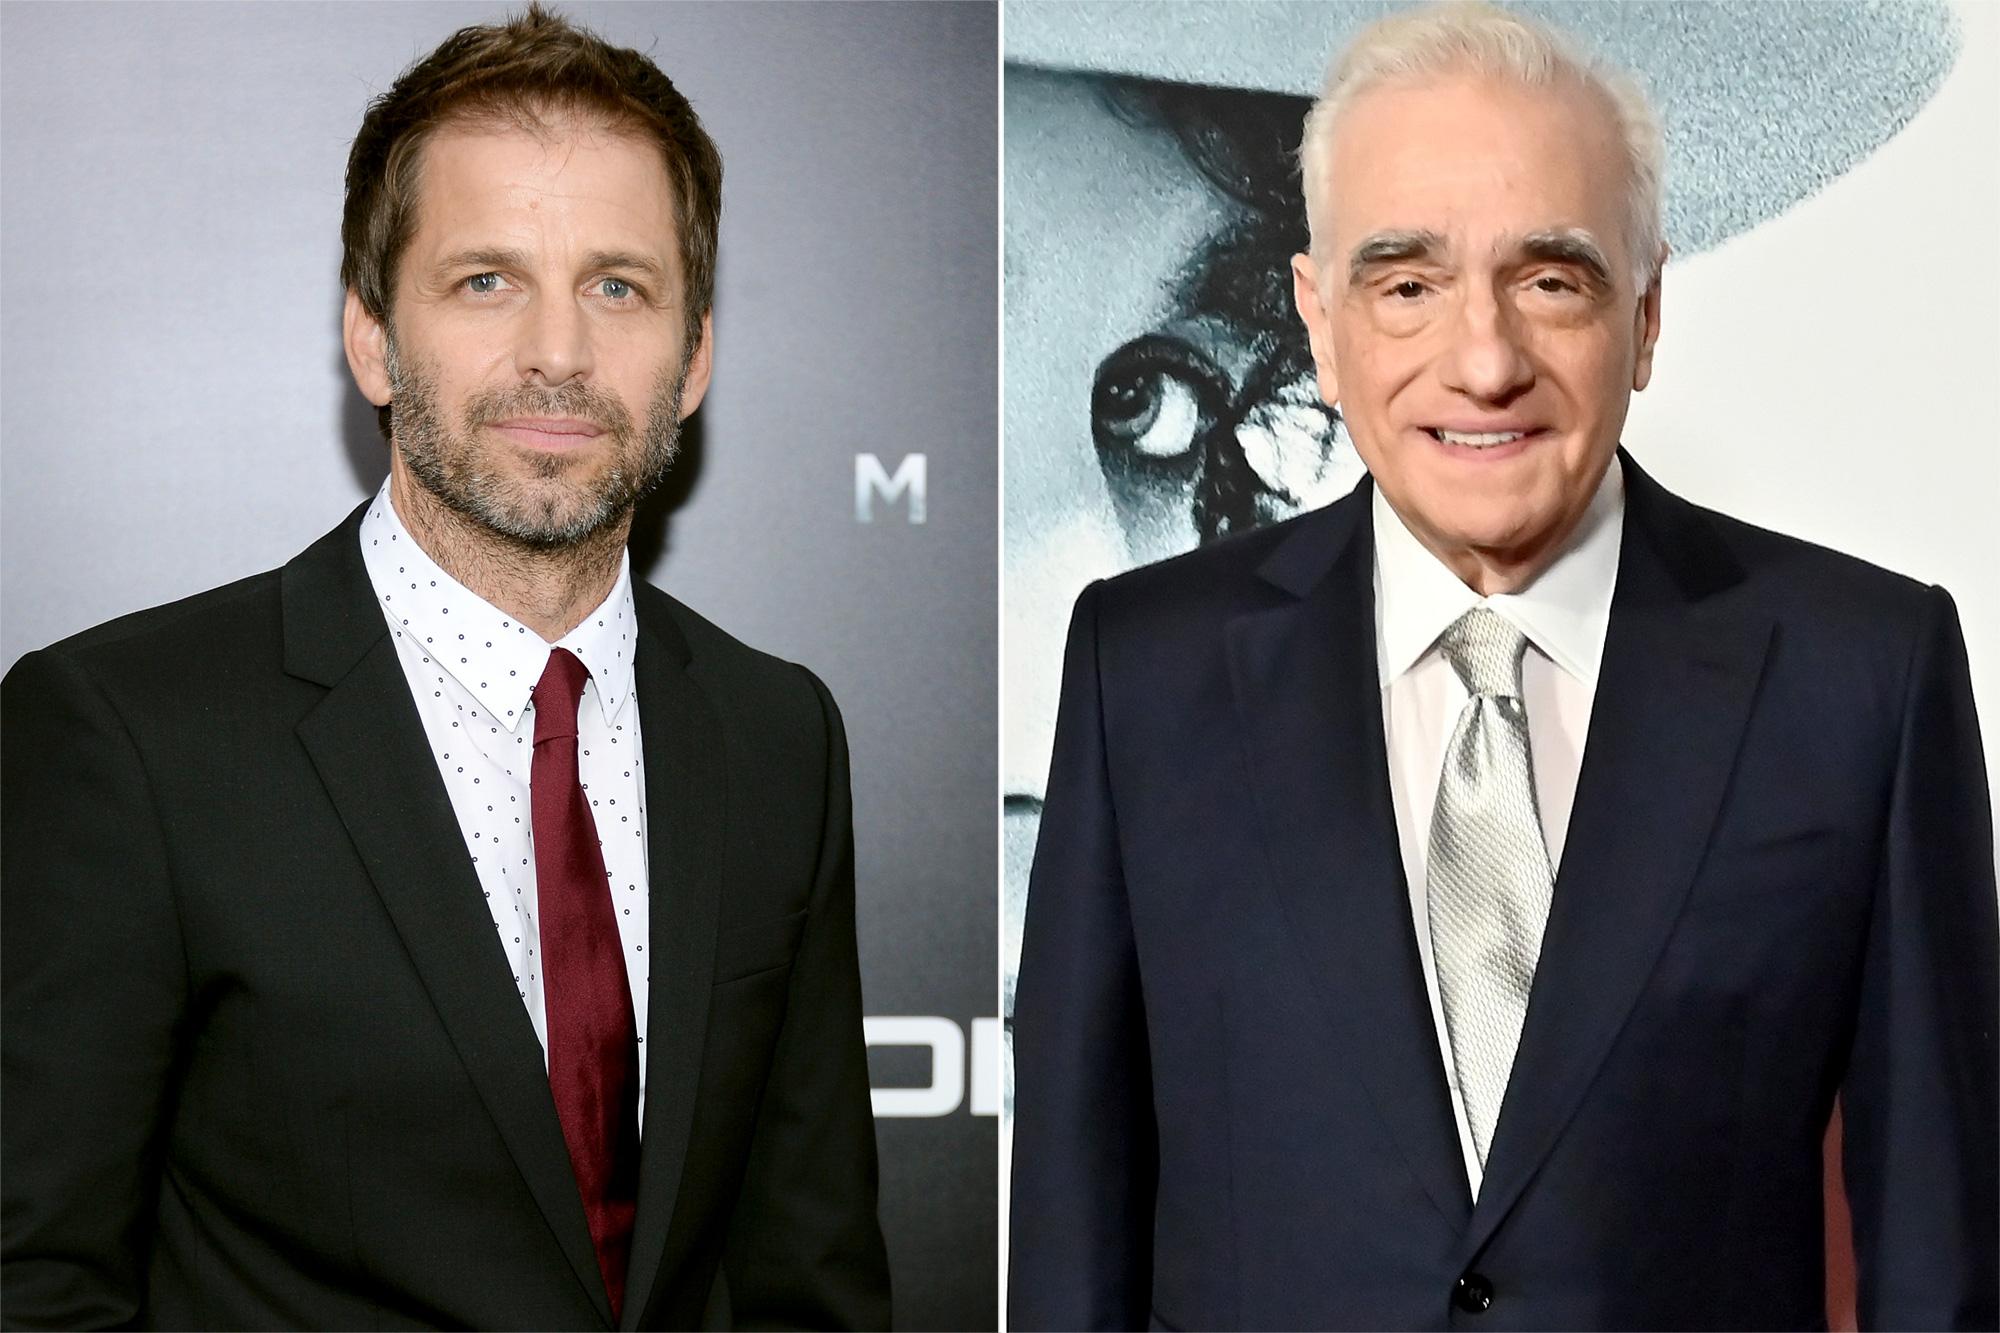 Zack Snyder, Martin Scorsese